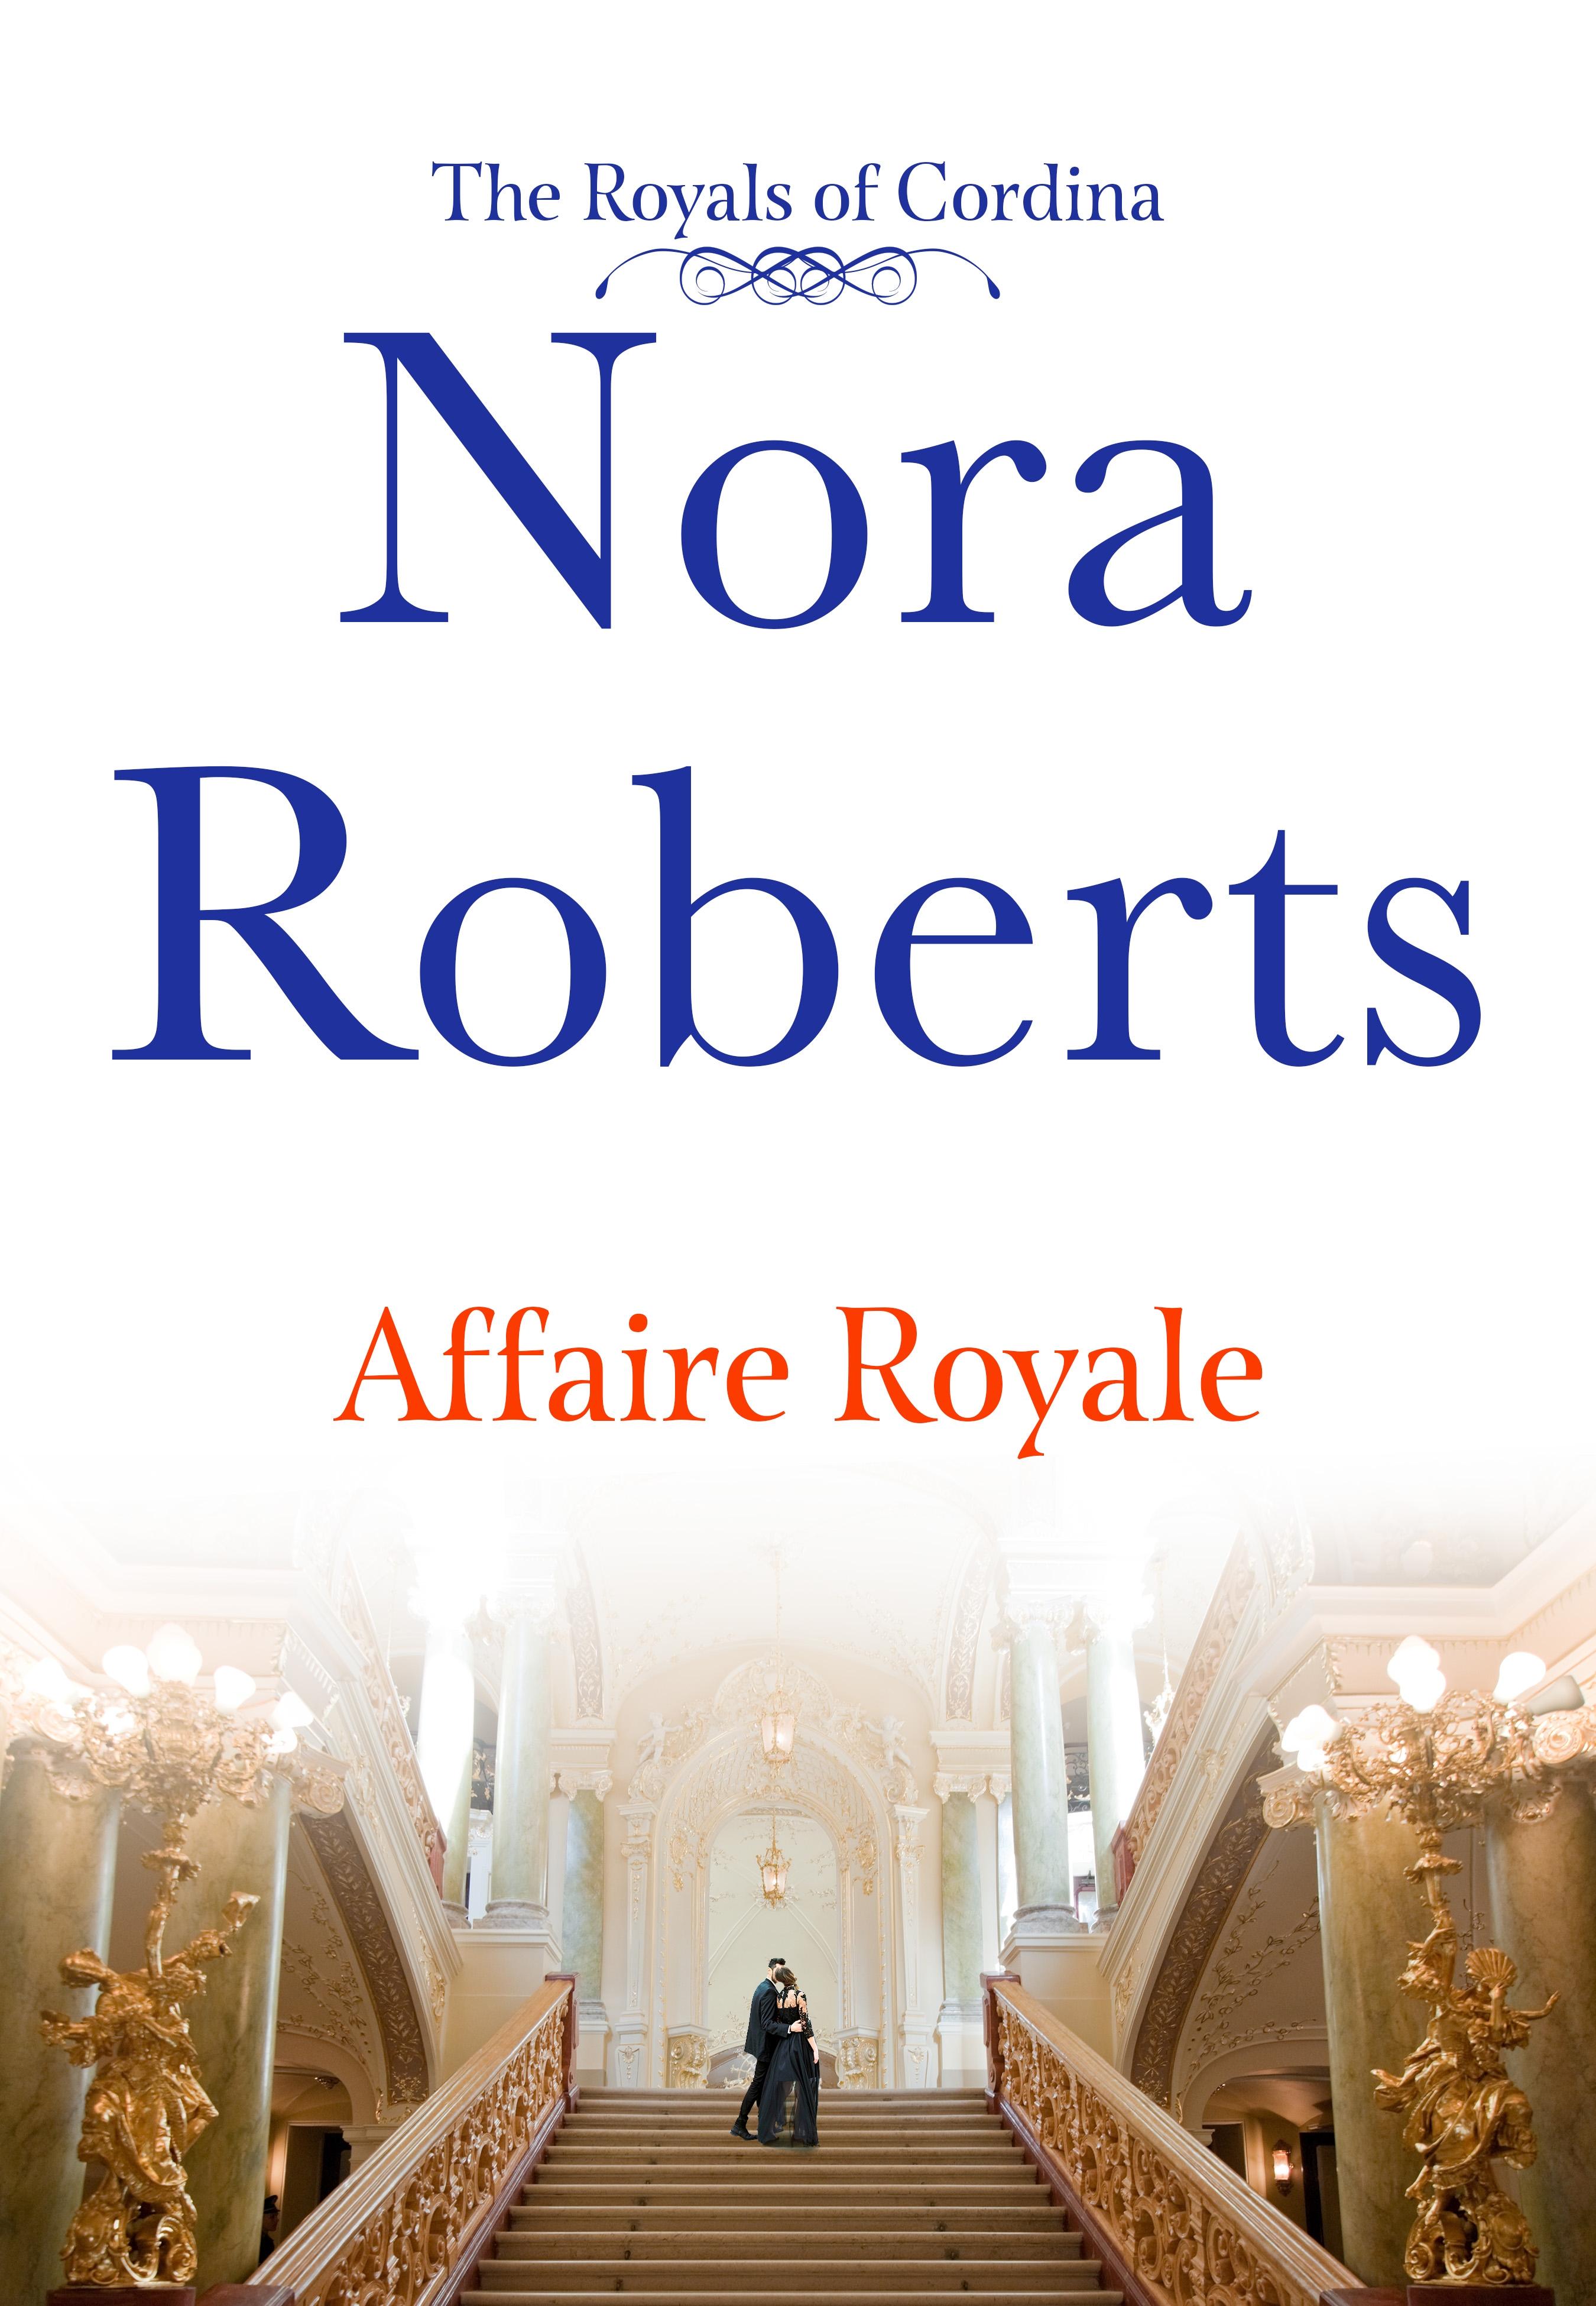 Affaire Royale The Royals of Cordina